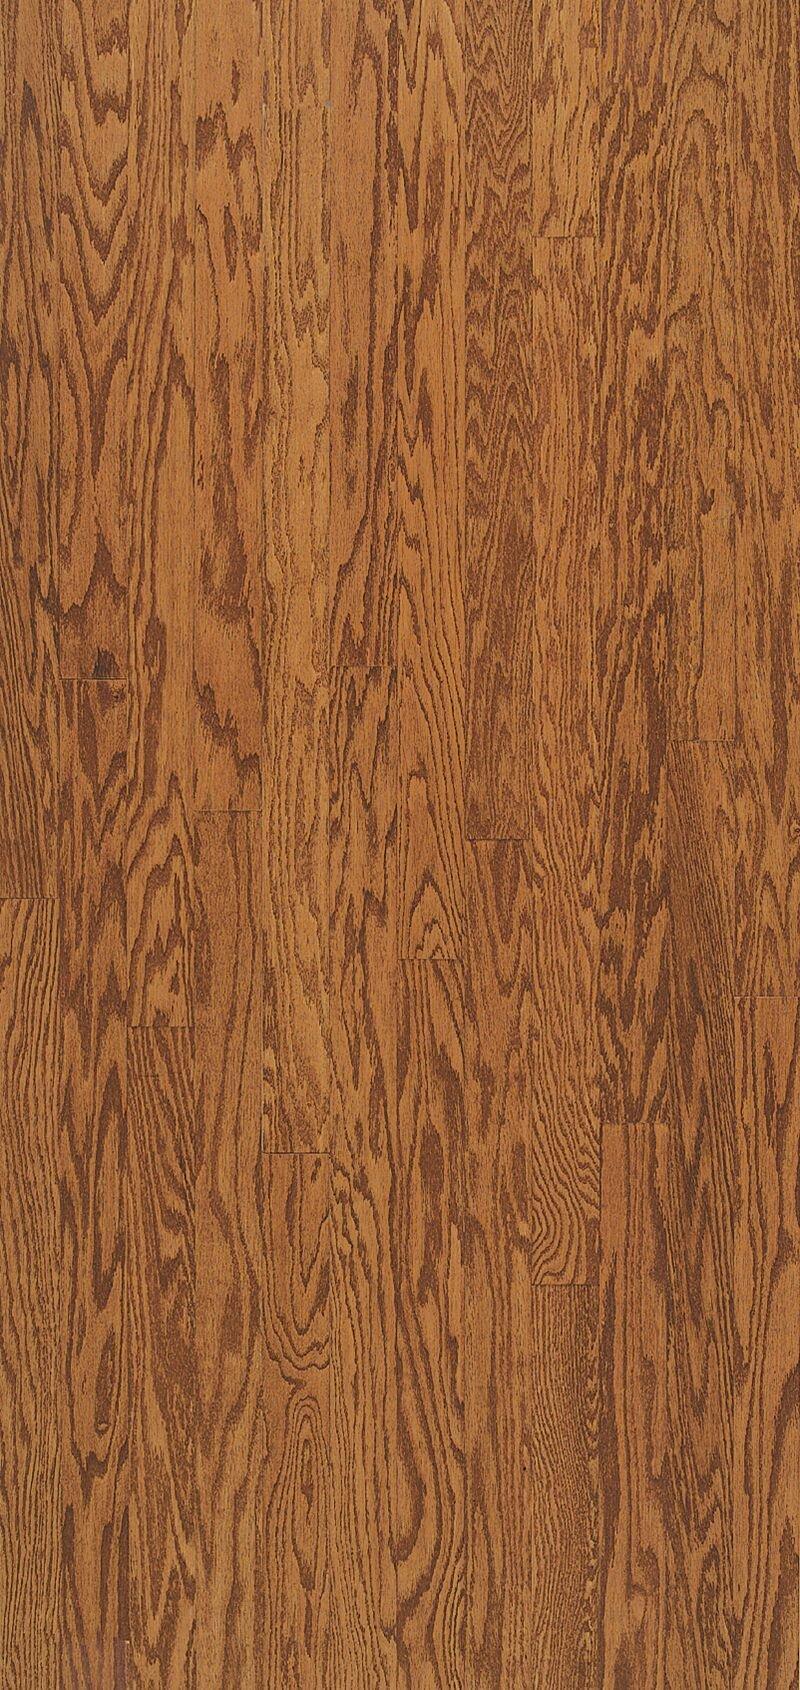 oak flooring gunstock hardwood img weshipfloors solid x floors